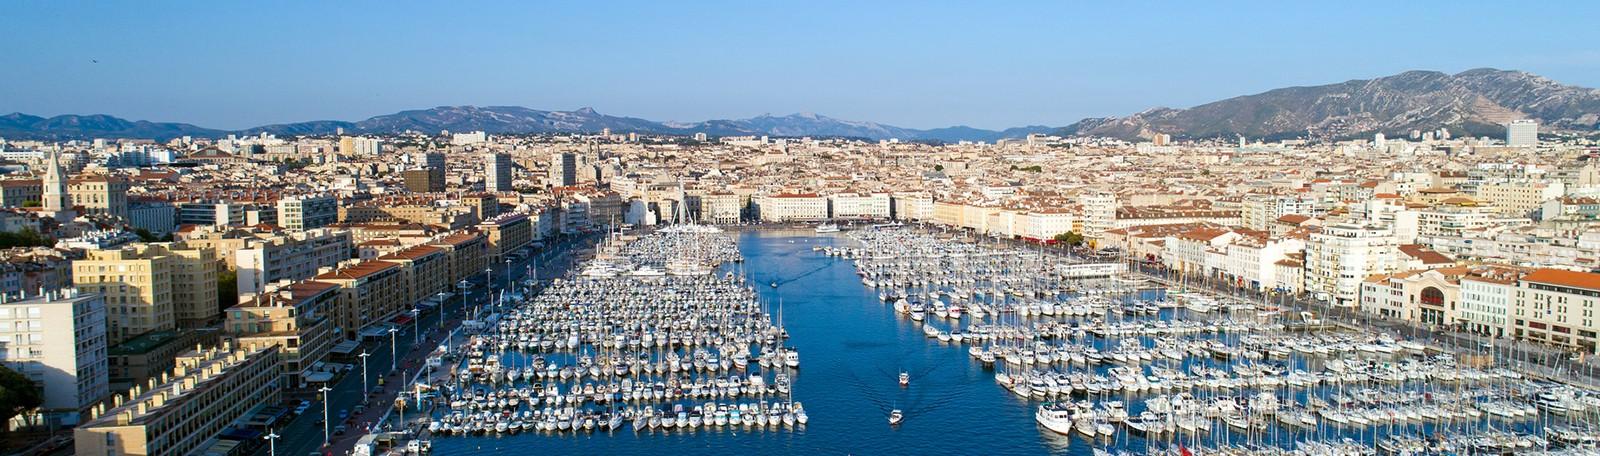 Car park Estrangin - Park in Marseille | Q-Park